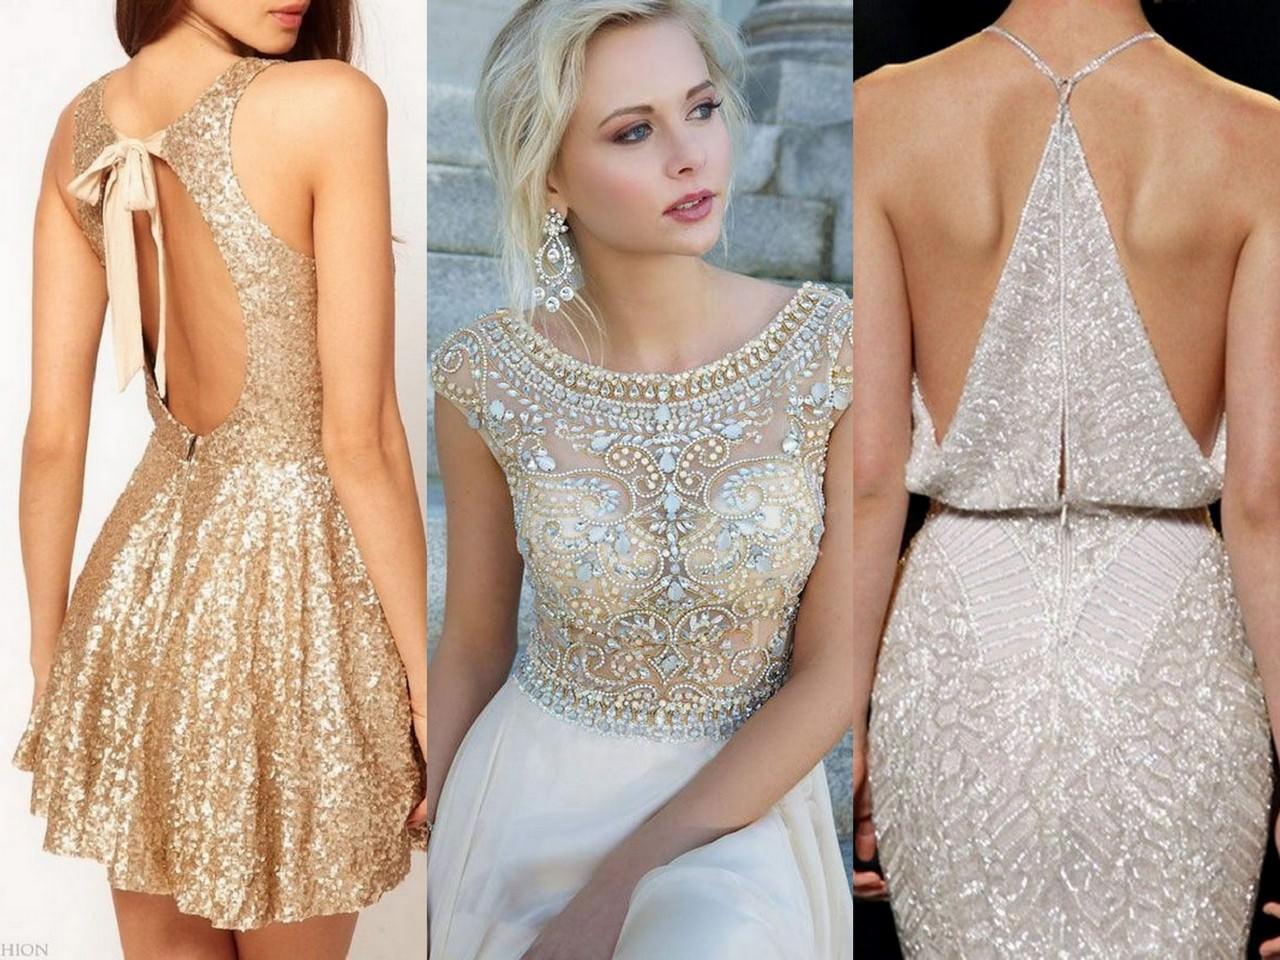 Платье укрытое бриллиантами